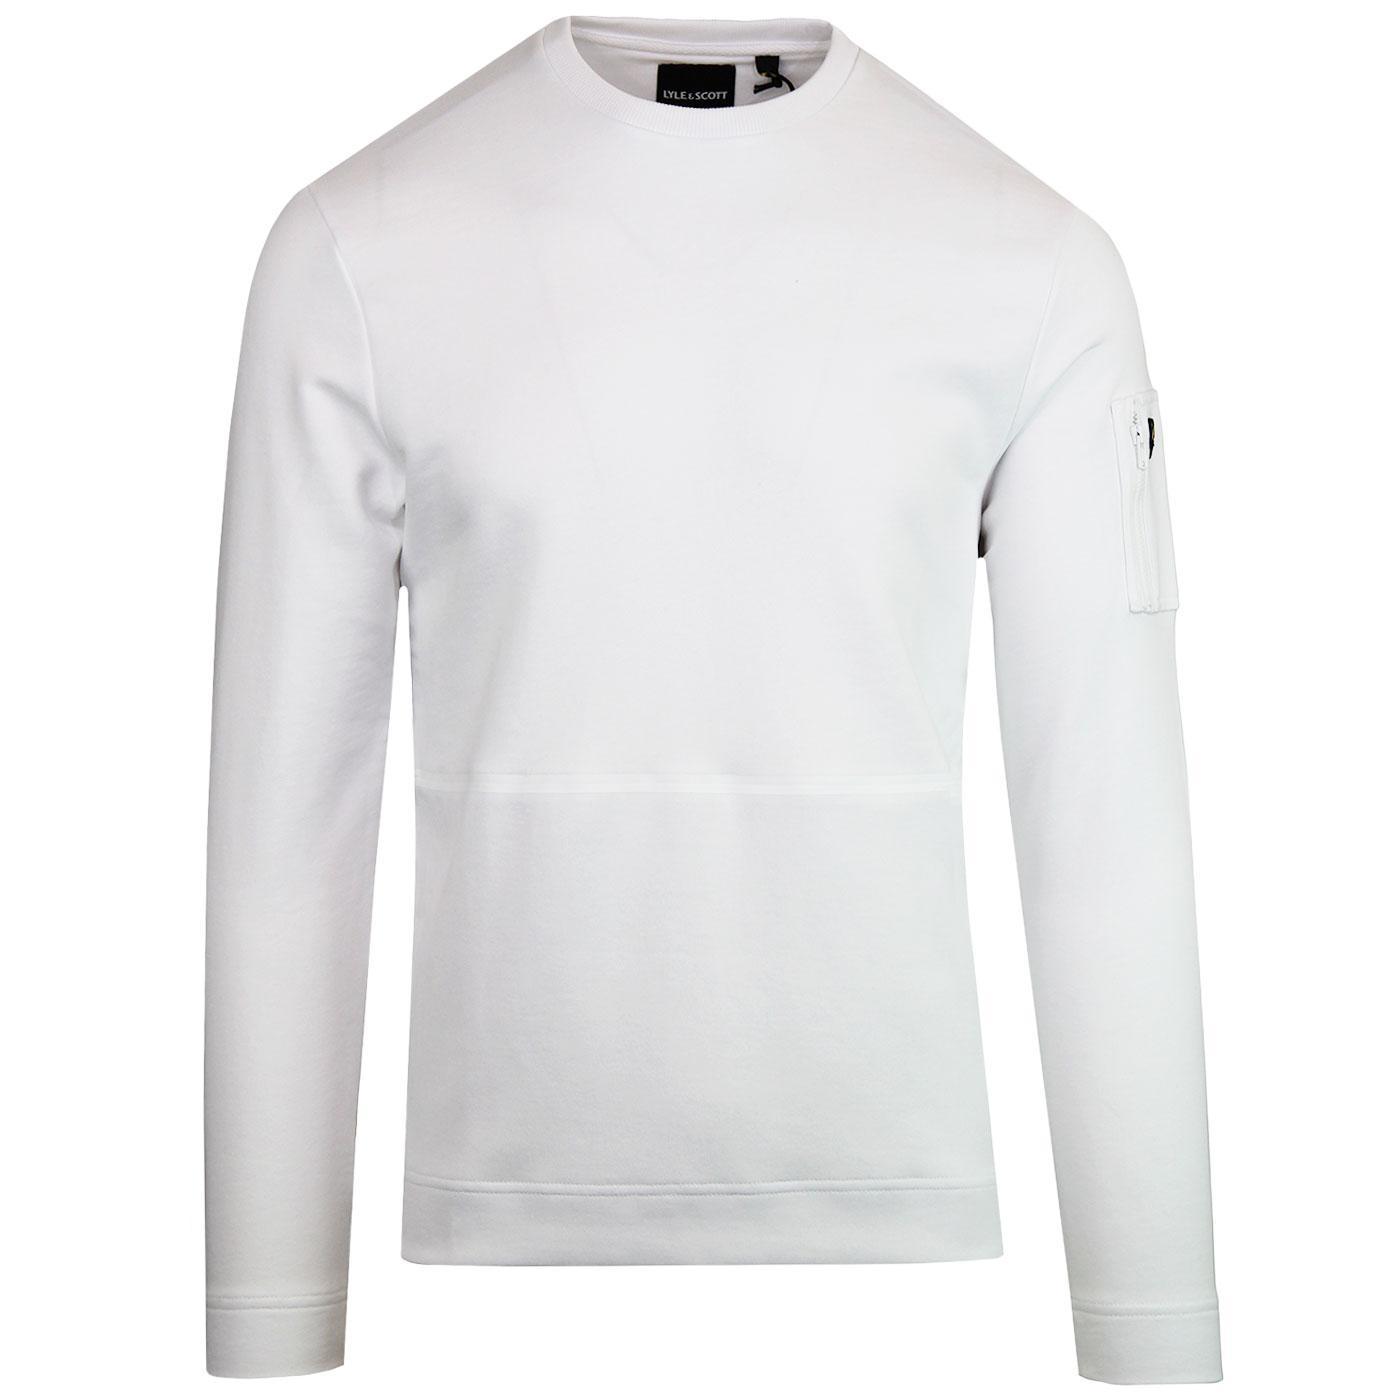 LYLE & SCOTT Men's Retro Casuals Sweatshirt WHITE